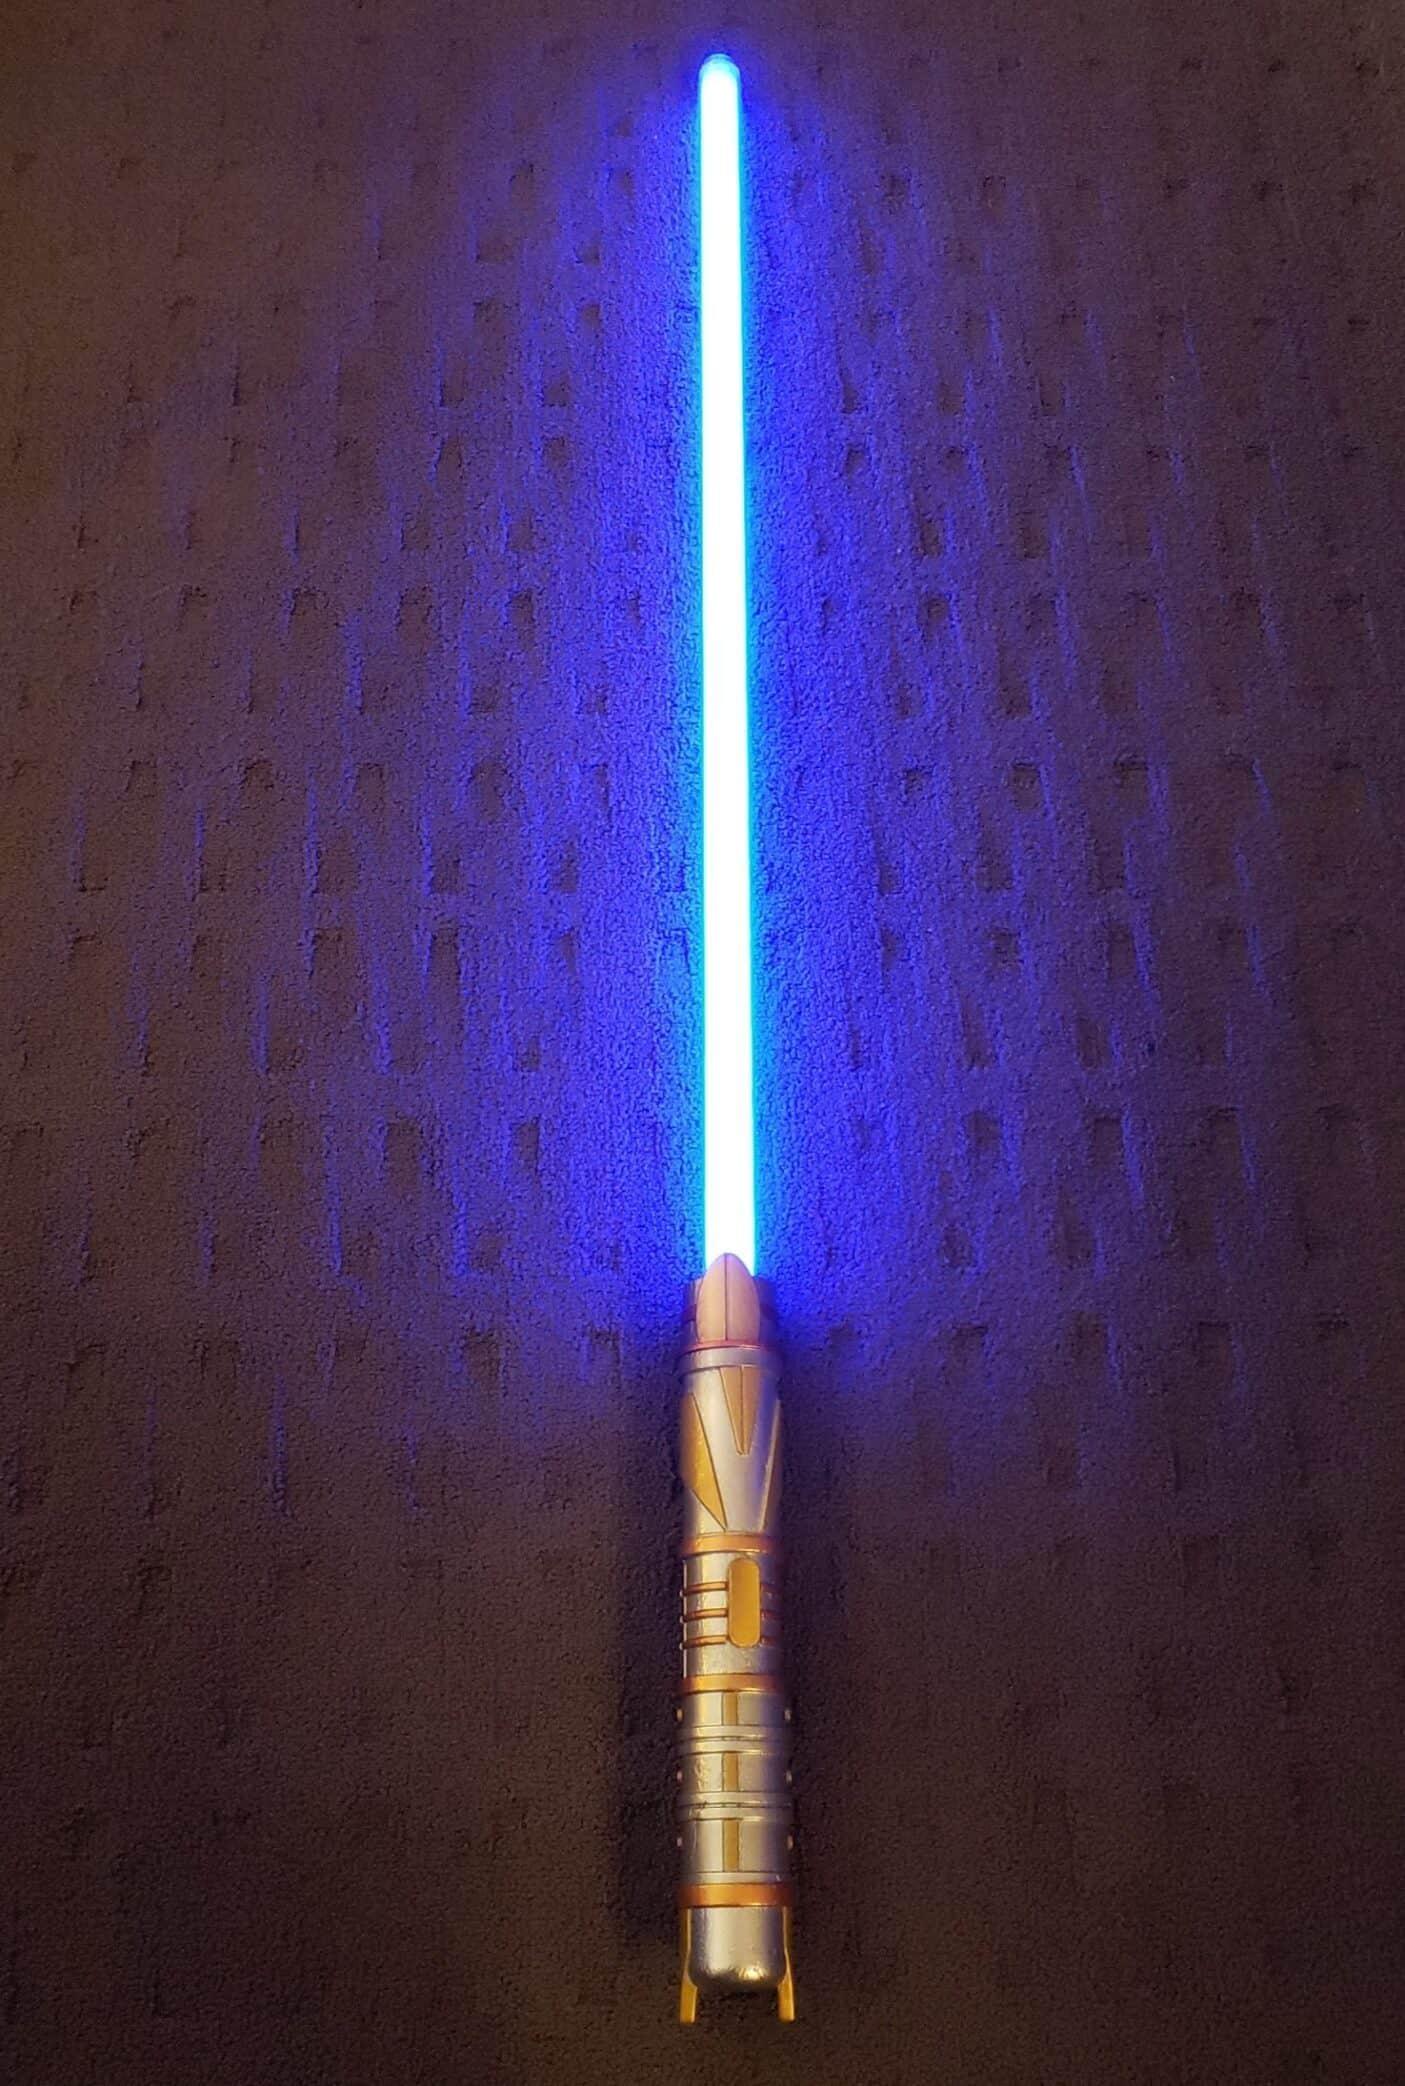 Savi's Workshop at Star Wars Galaxy's Edge Protection and Defense Lightsaber